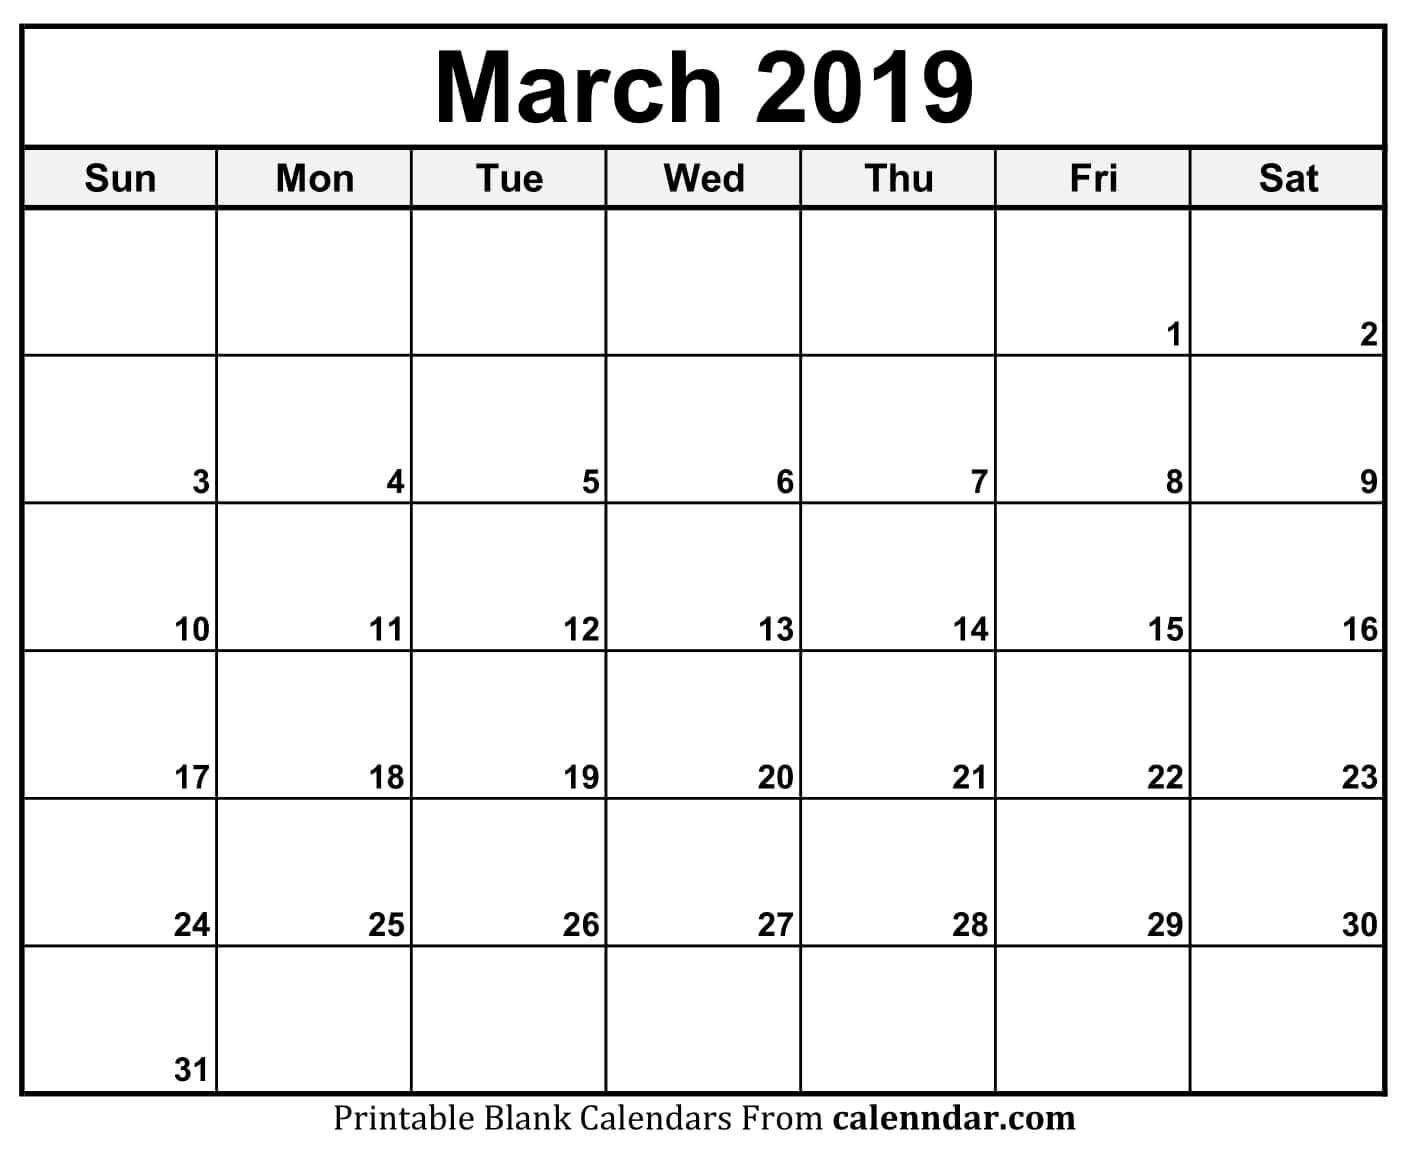 March Calendar 2019 11×17 #march #march2019calendar In 11×17